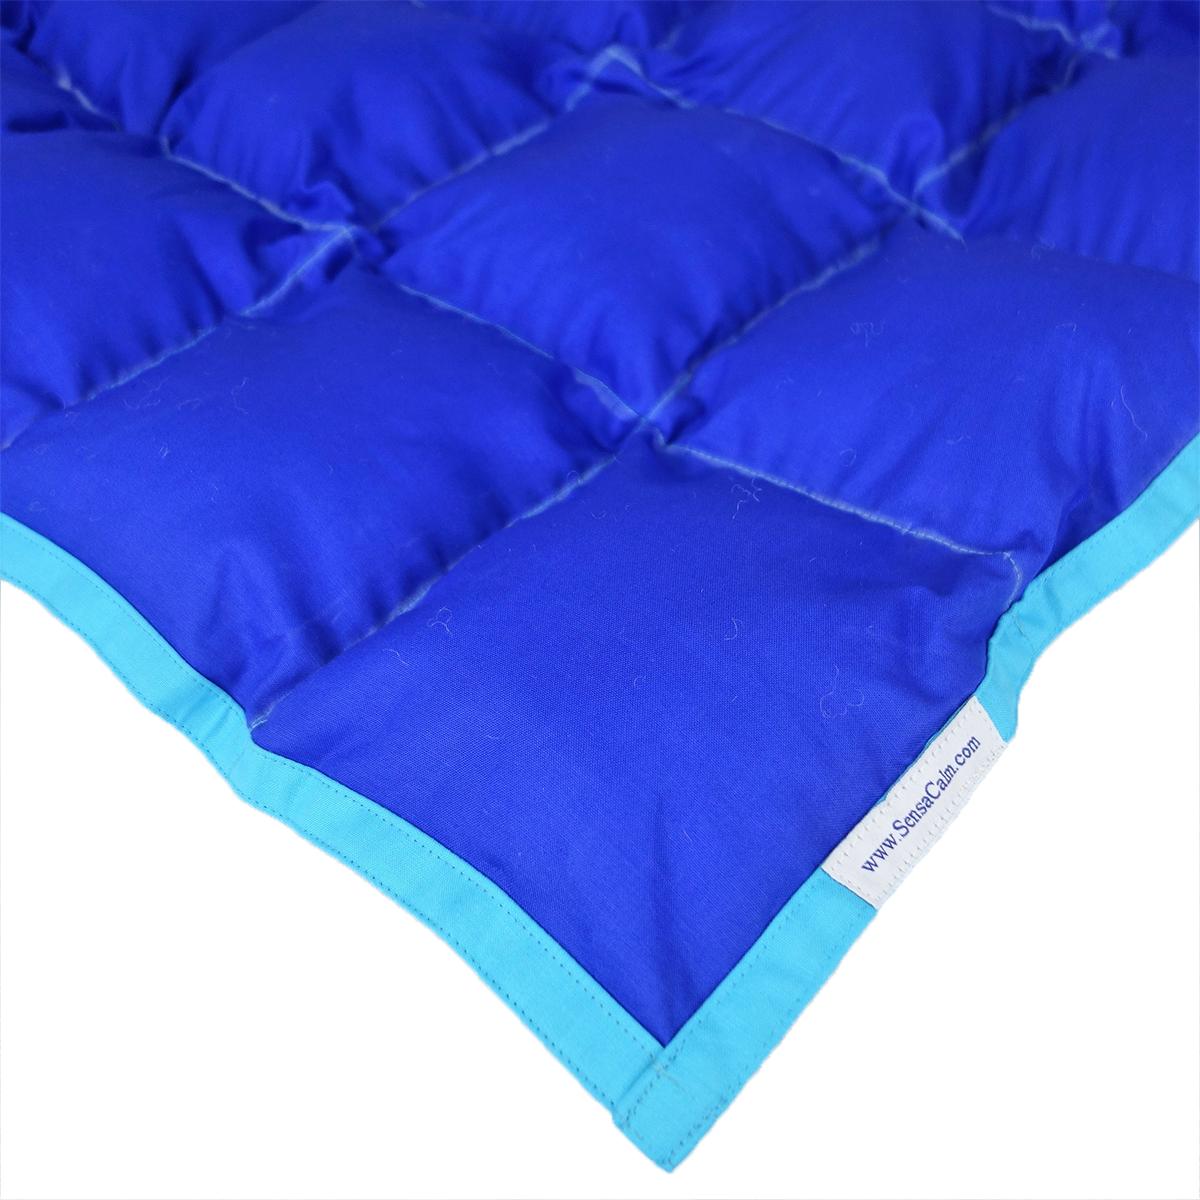 SensaCalm Dazzling Blue w  Scuba Blue Small 5 lb Weighted Blanket by Sensacalm